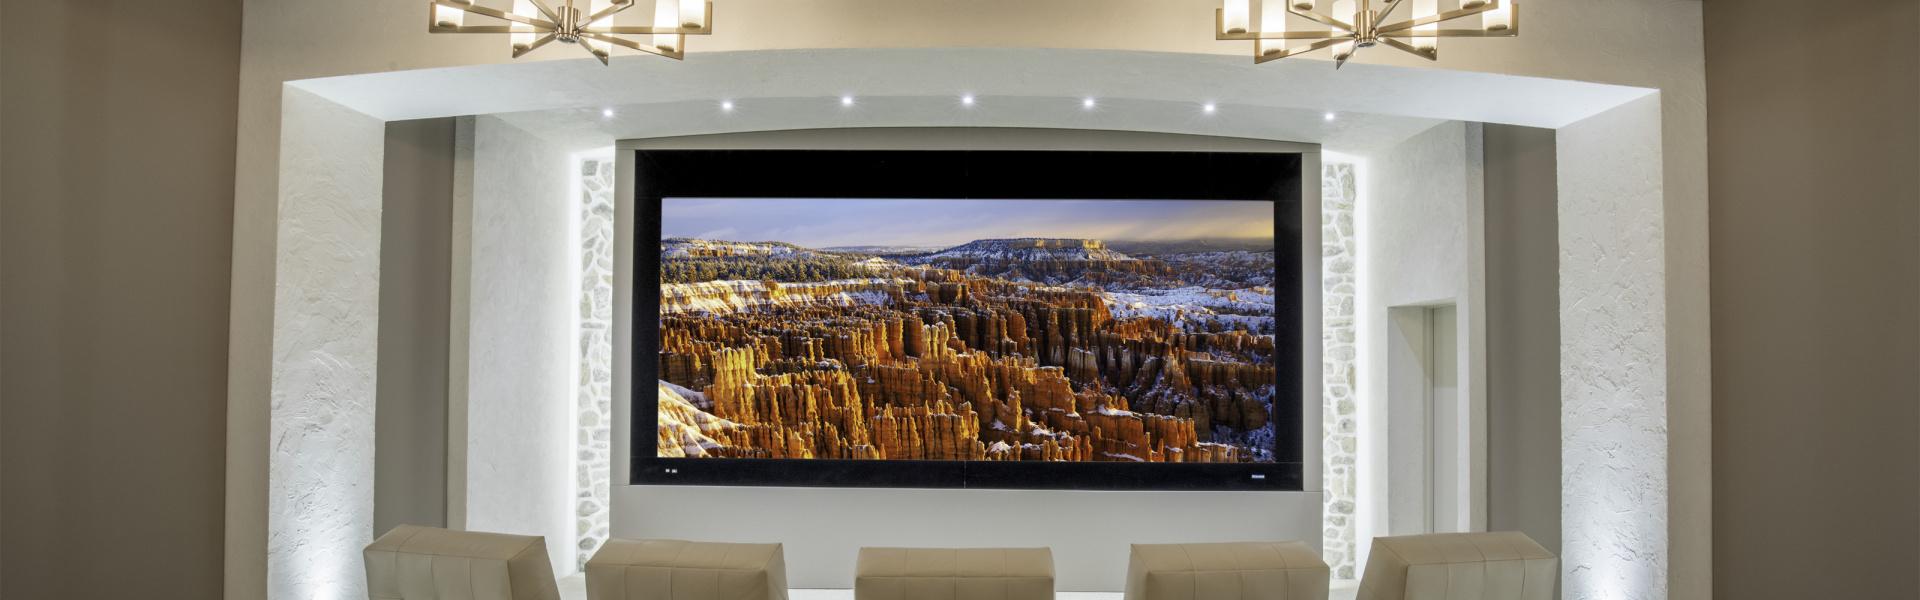 Smart home installation by Design Electronics for Niagara Falls